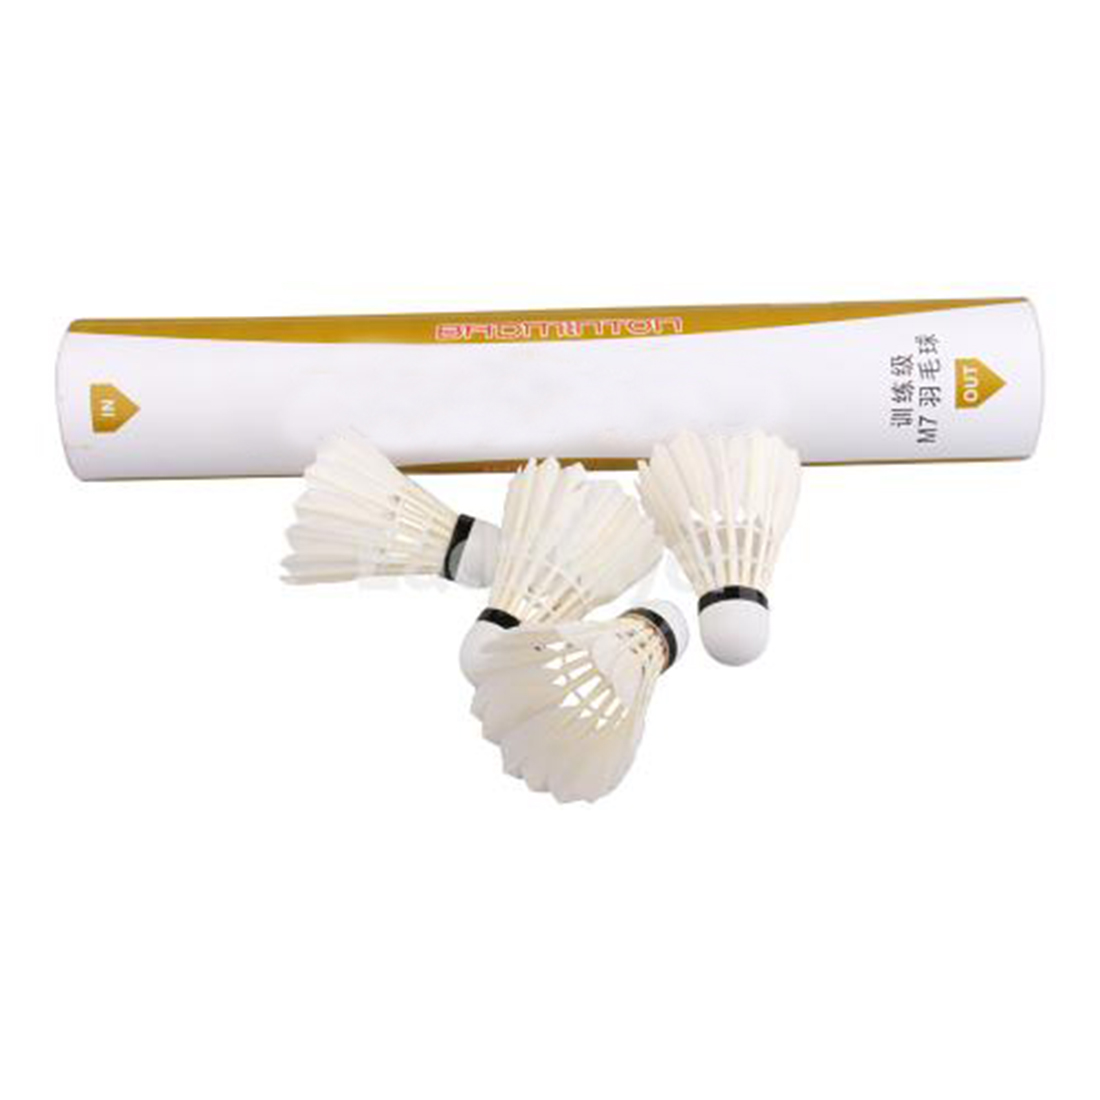 12 Pcs Portable White Goose Feather Training Badminton Balls Shuttlecocks Sport Products